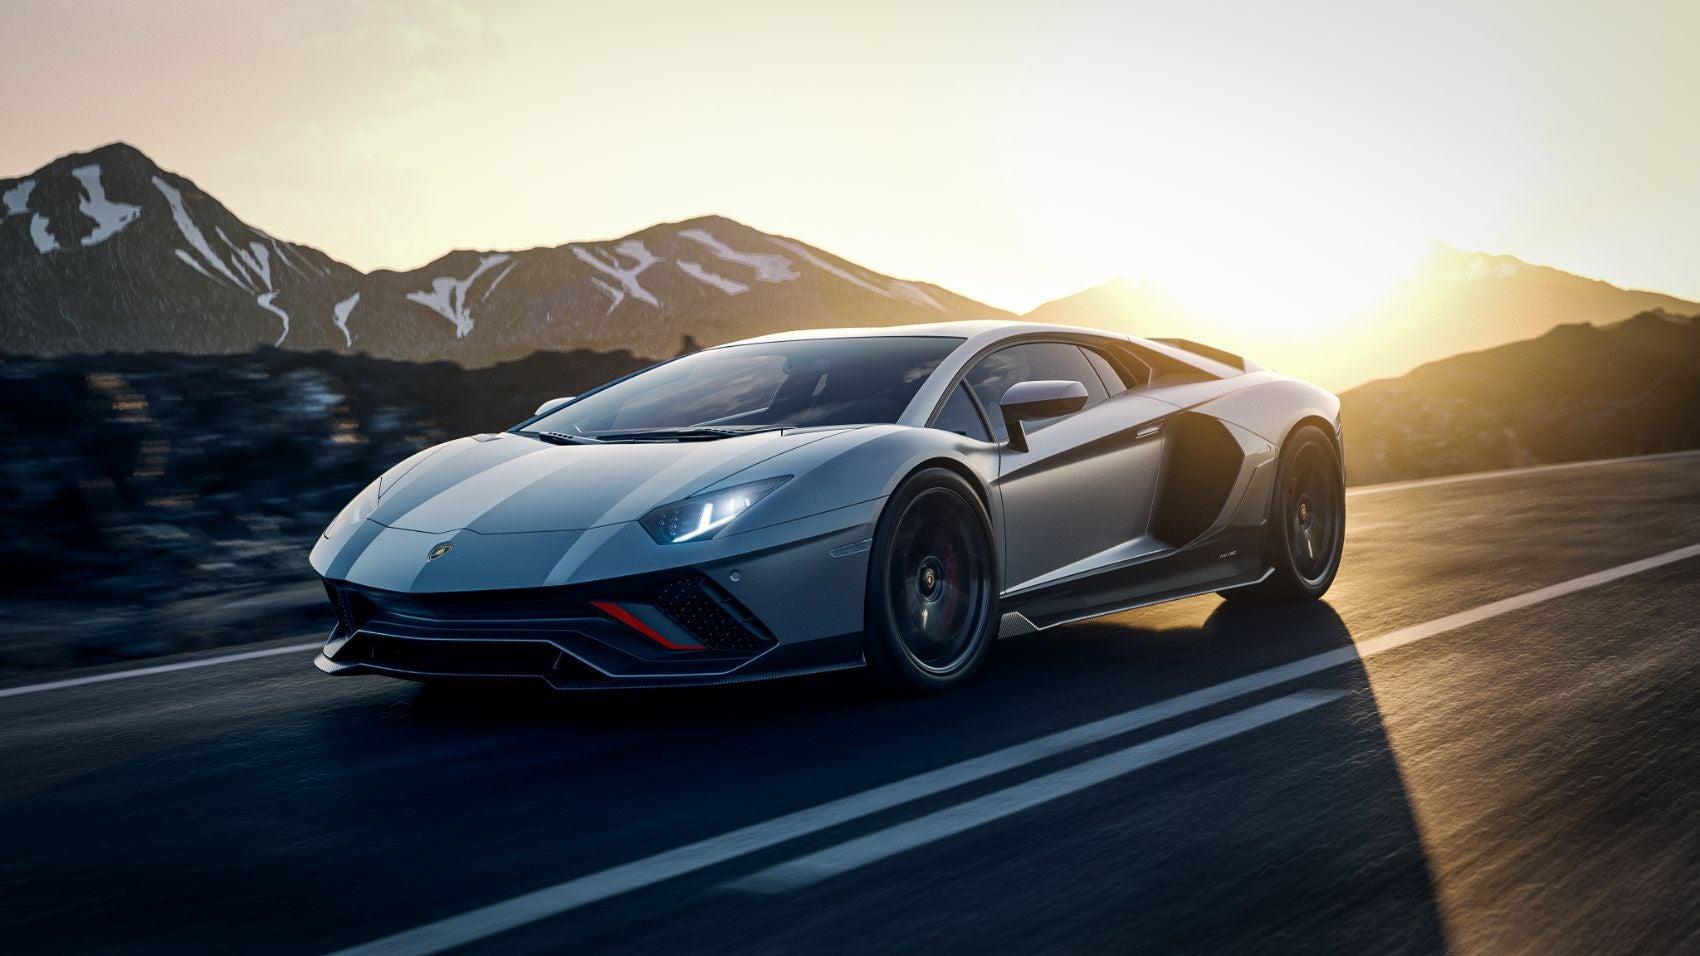 Lamborghini Aventador LP 780-4 Ultimae: The Ultimate Sendoff For The Great V12 Aventador?